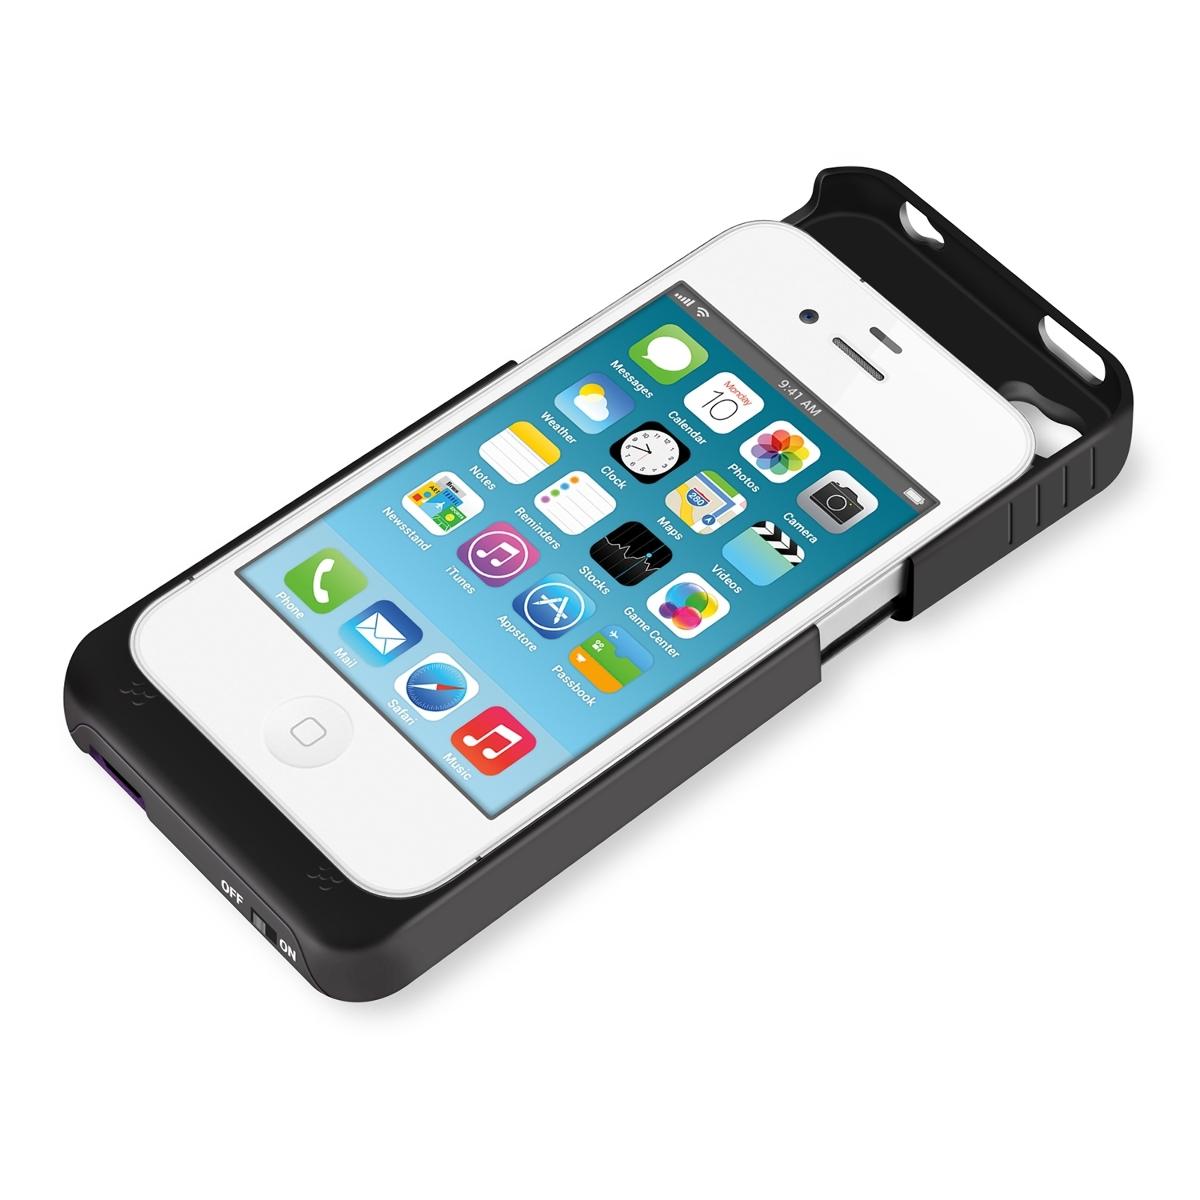 kwmobile external battery case f apple iphone 4 4s 1900mah. Black Bedroom Furniture Sets. Home Design Ideas